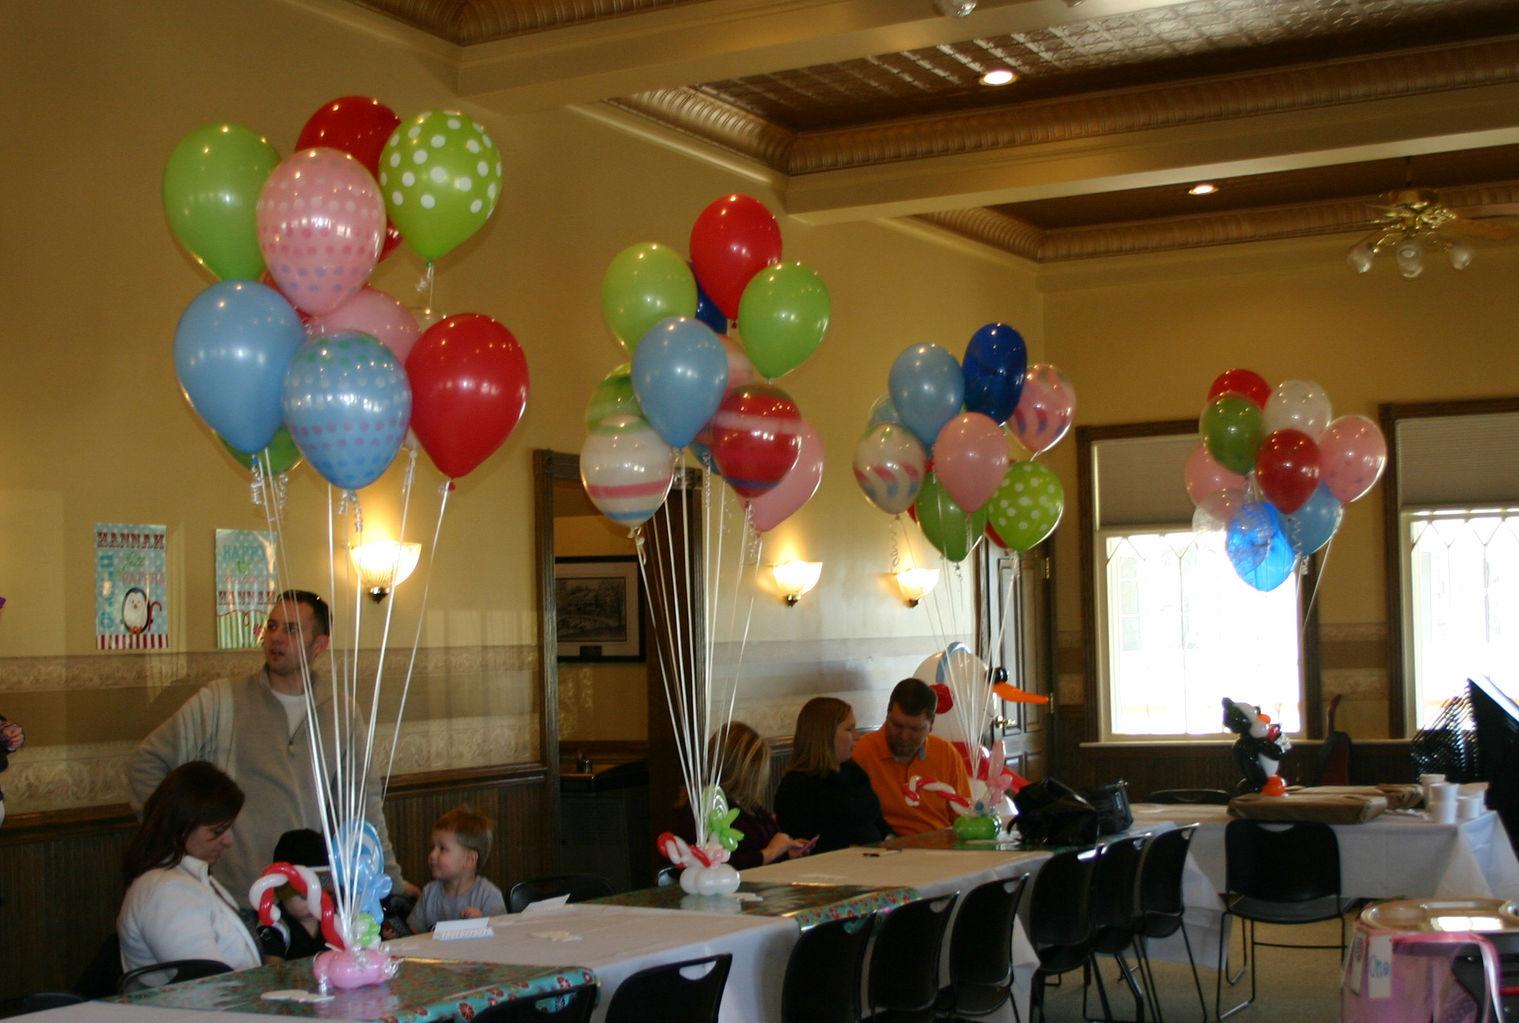 Balloongenuity ingenious balloon creativity central for Helium balloon centerpieces